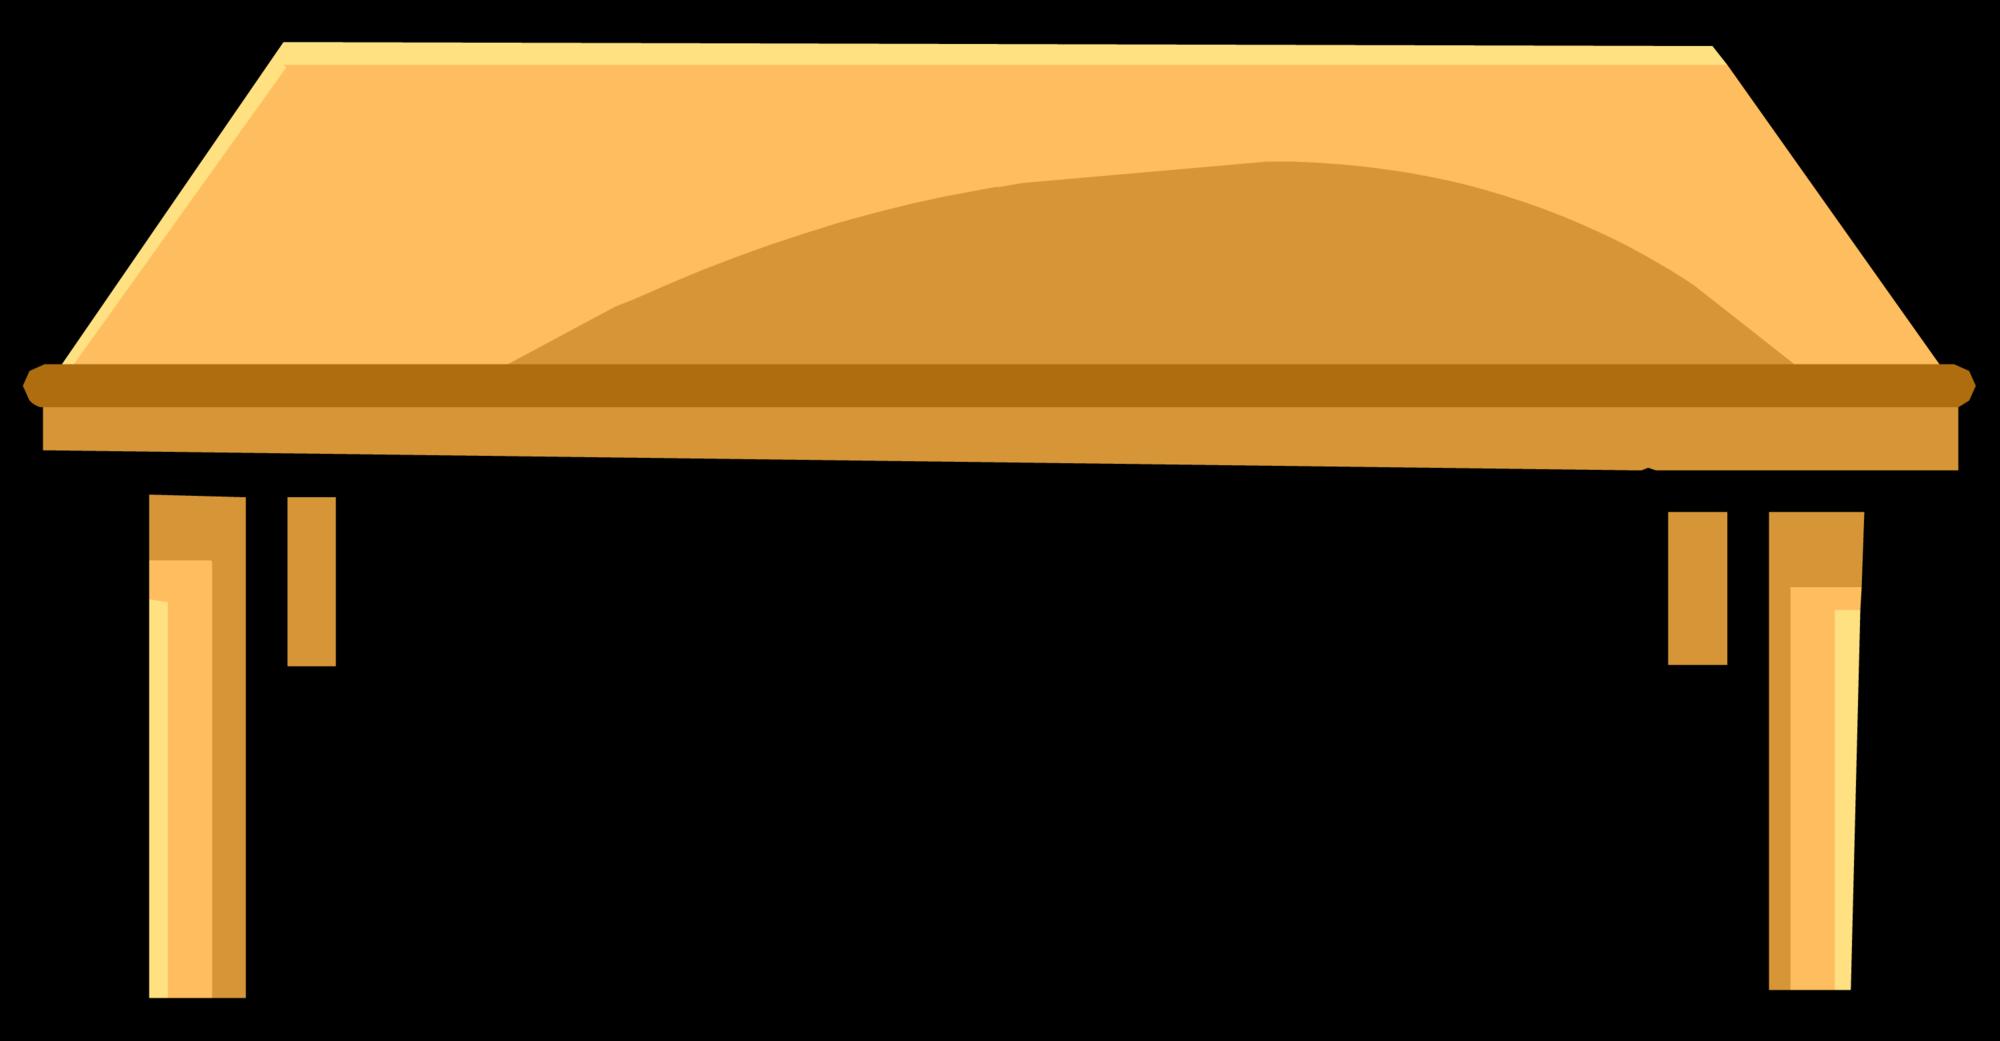 Clipart table coffee table. Club penguin wiki fandom